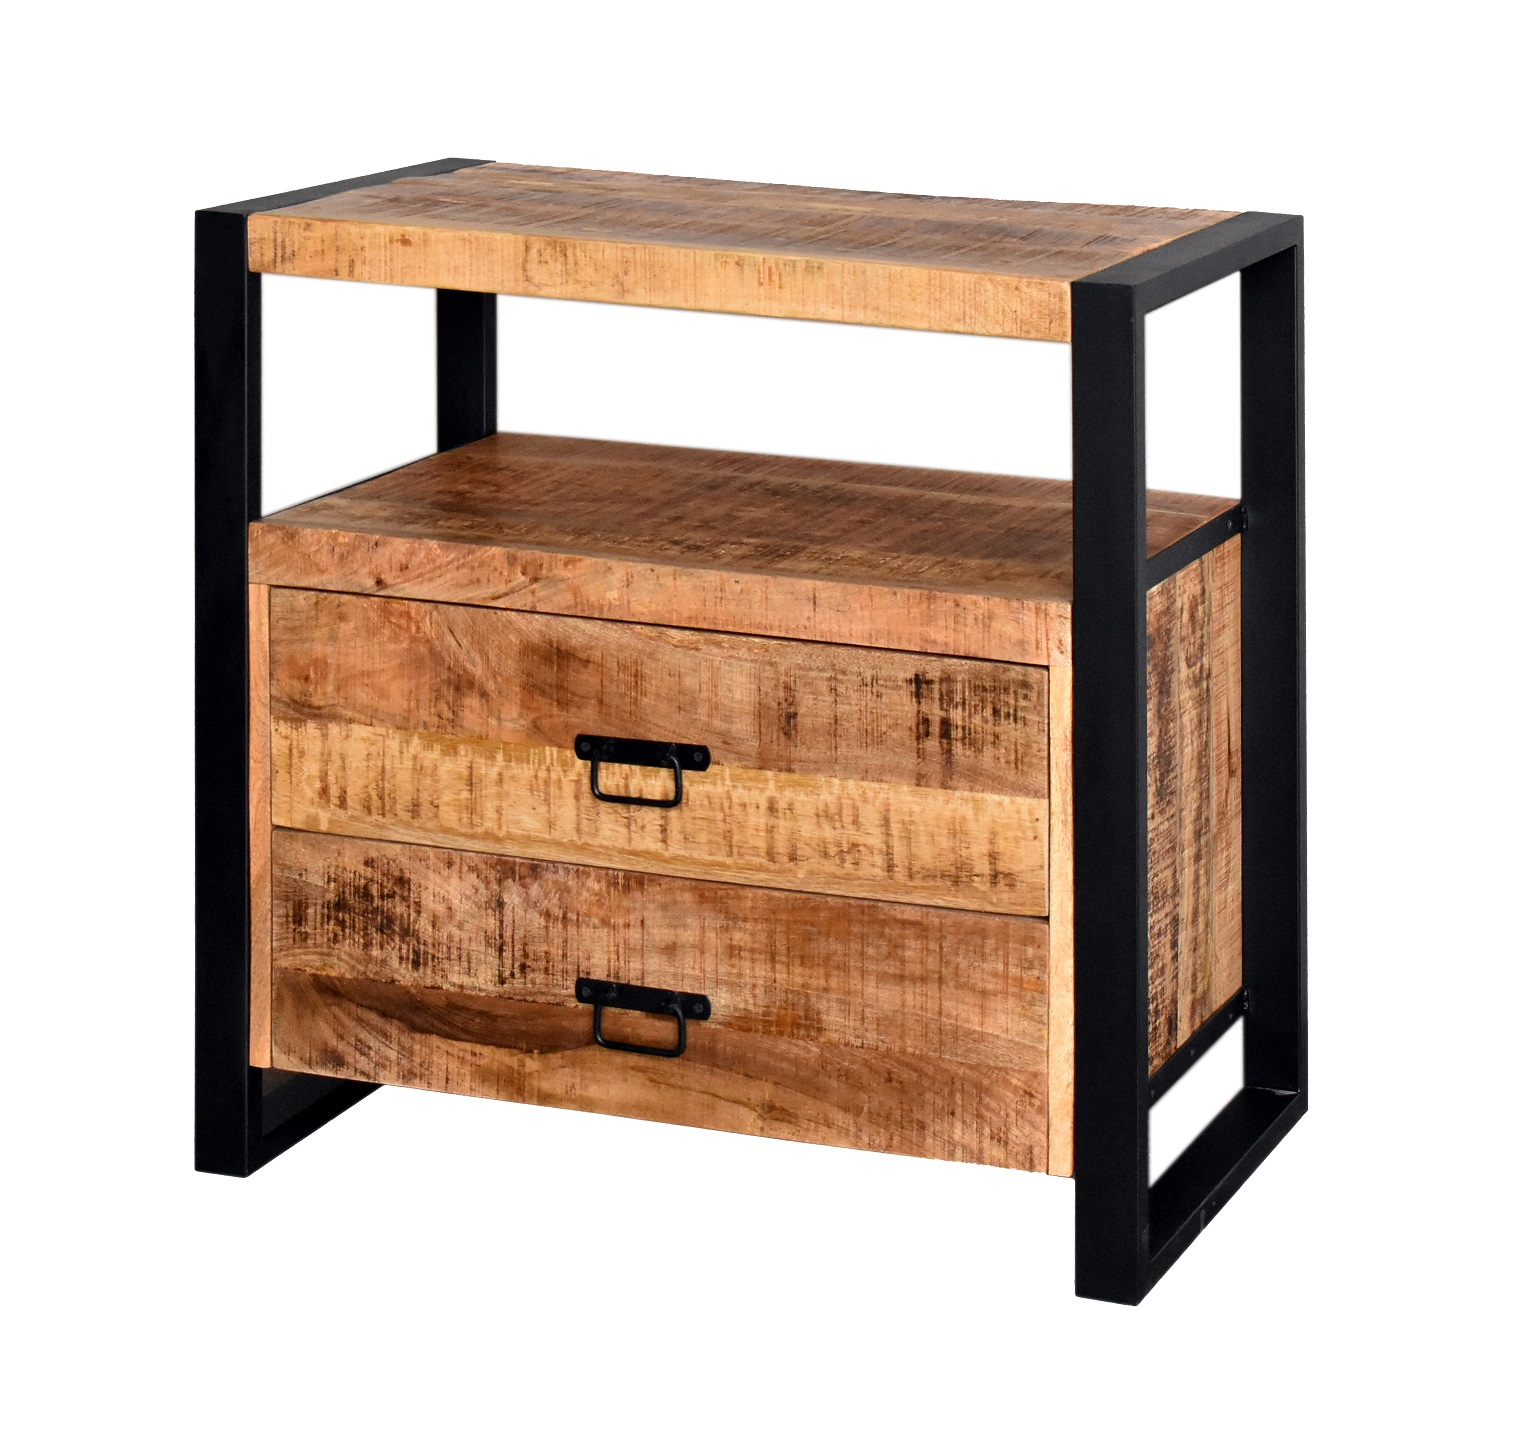 MD Interior Woodz badkamermeubel 80x45cm mangohout zonder kom